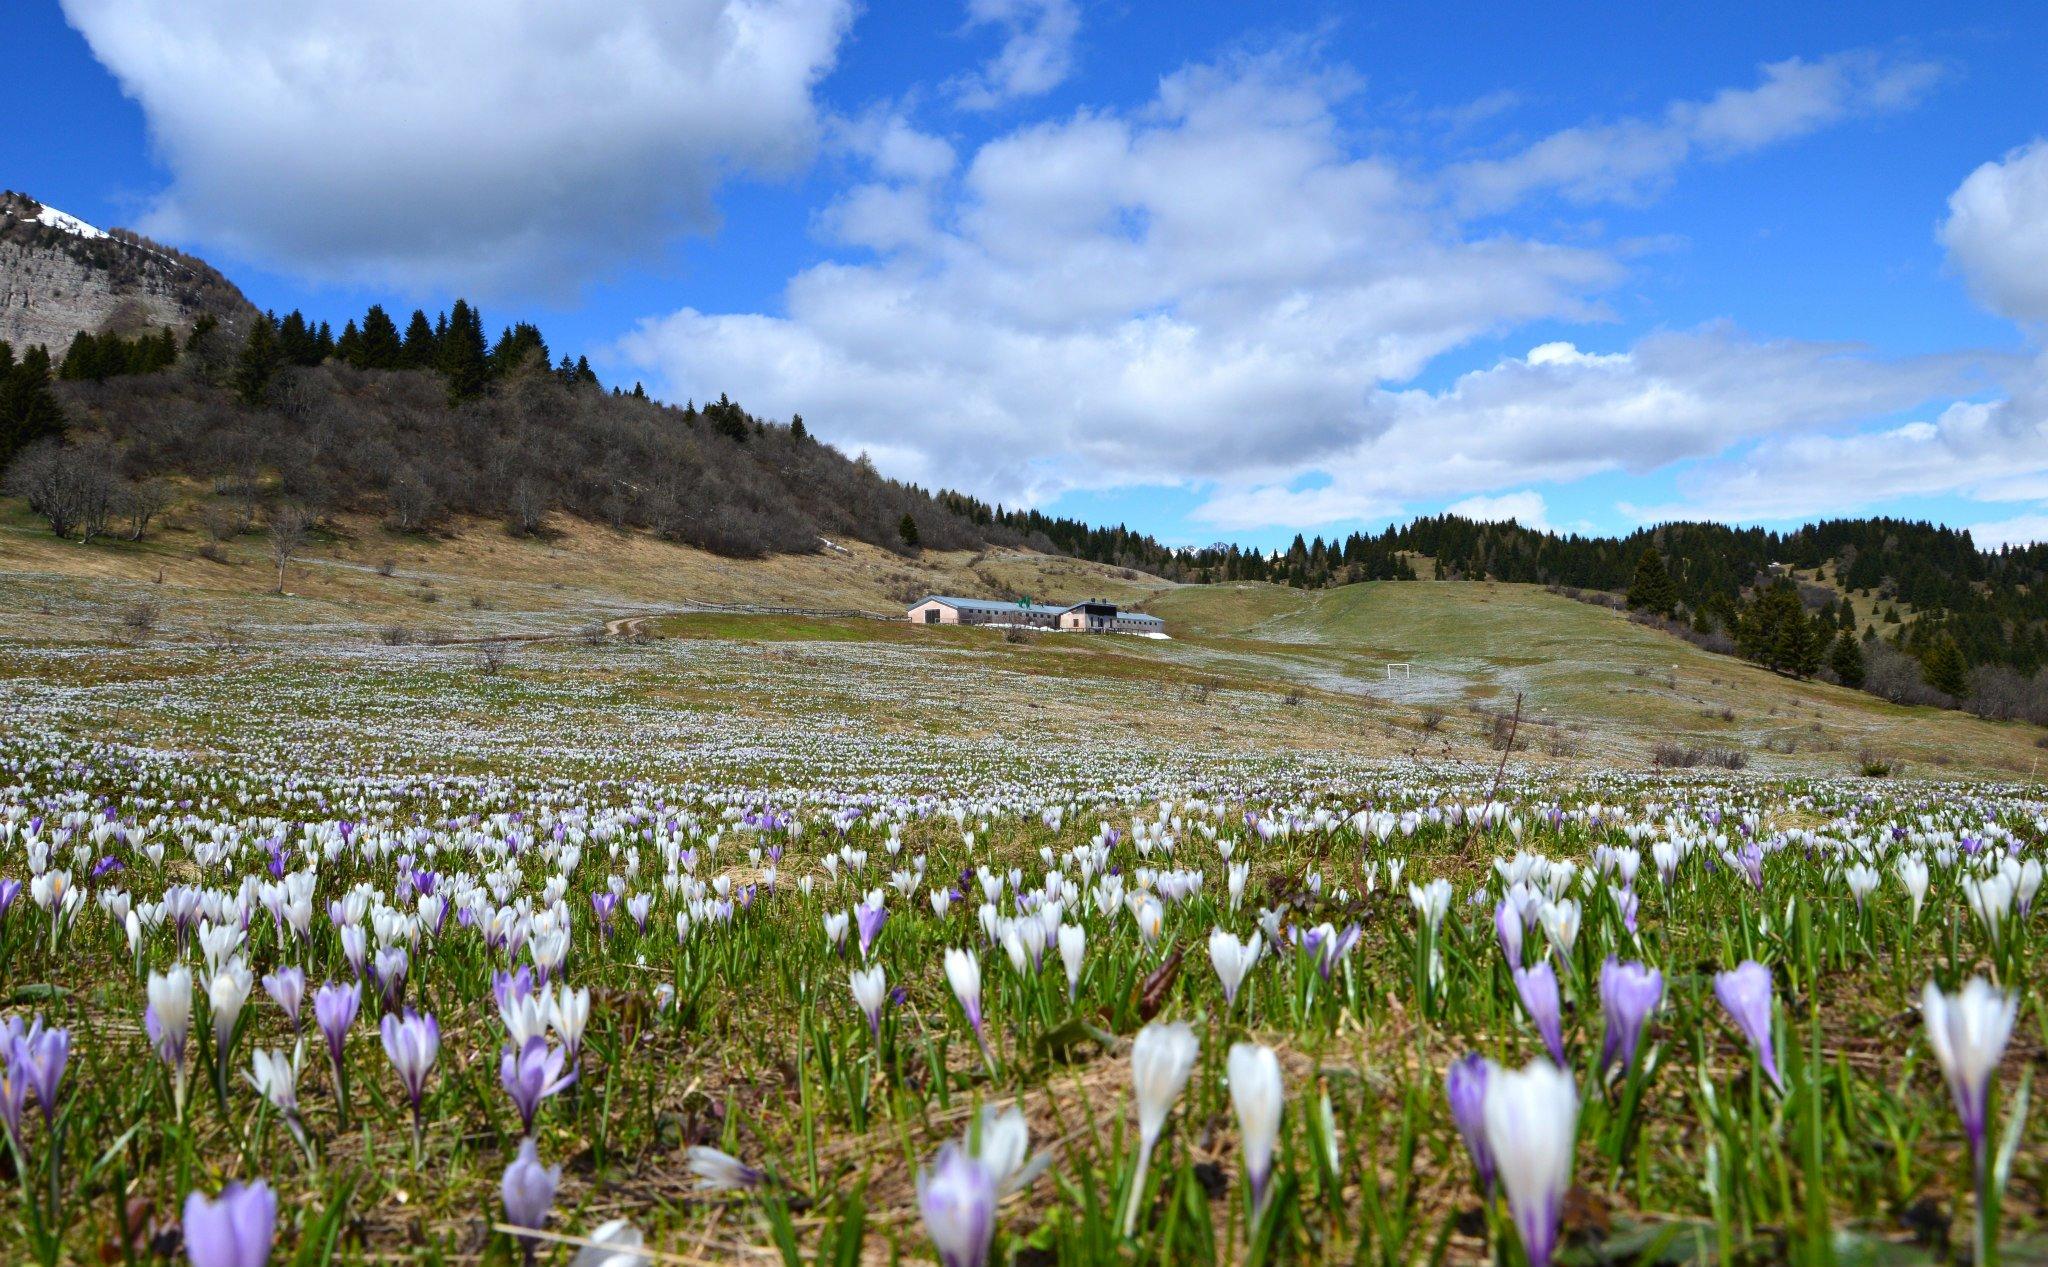 Andar per malghe in primavera tra le fioriture alpine